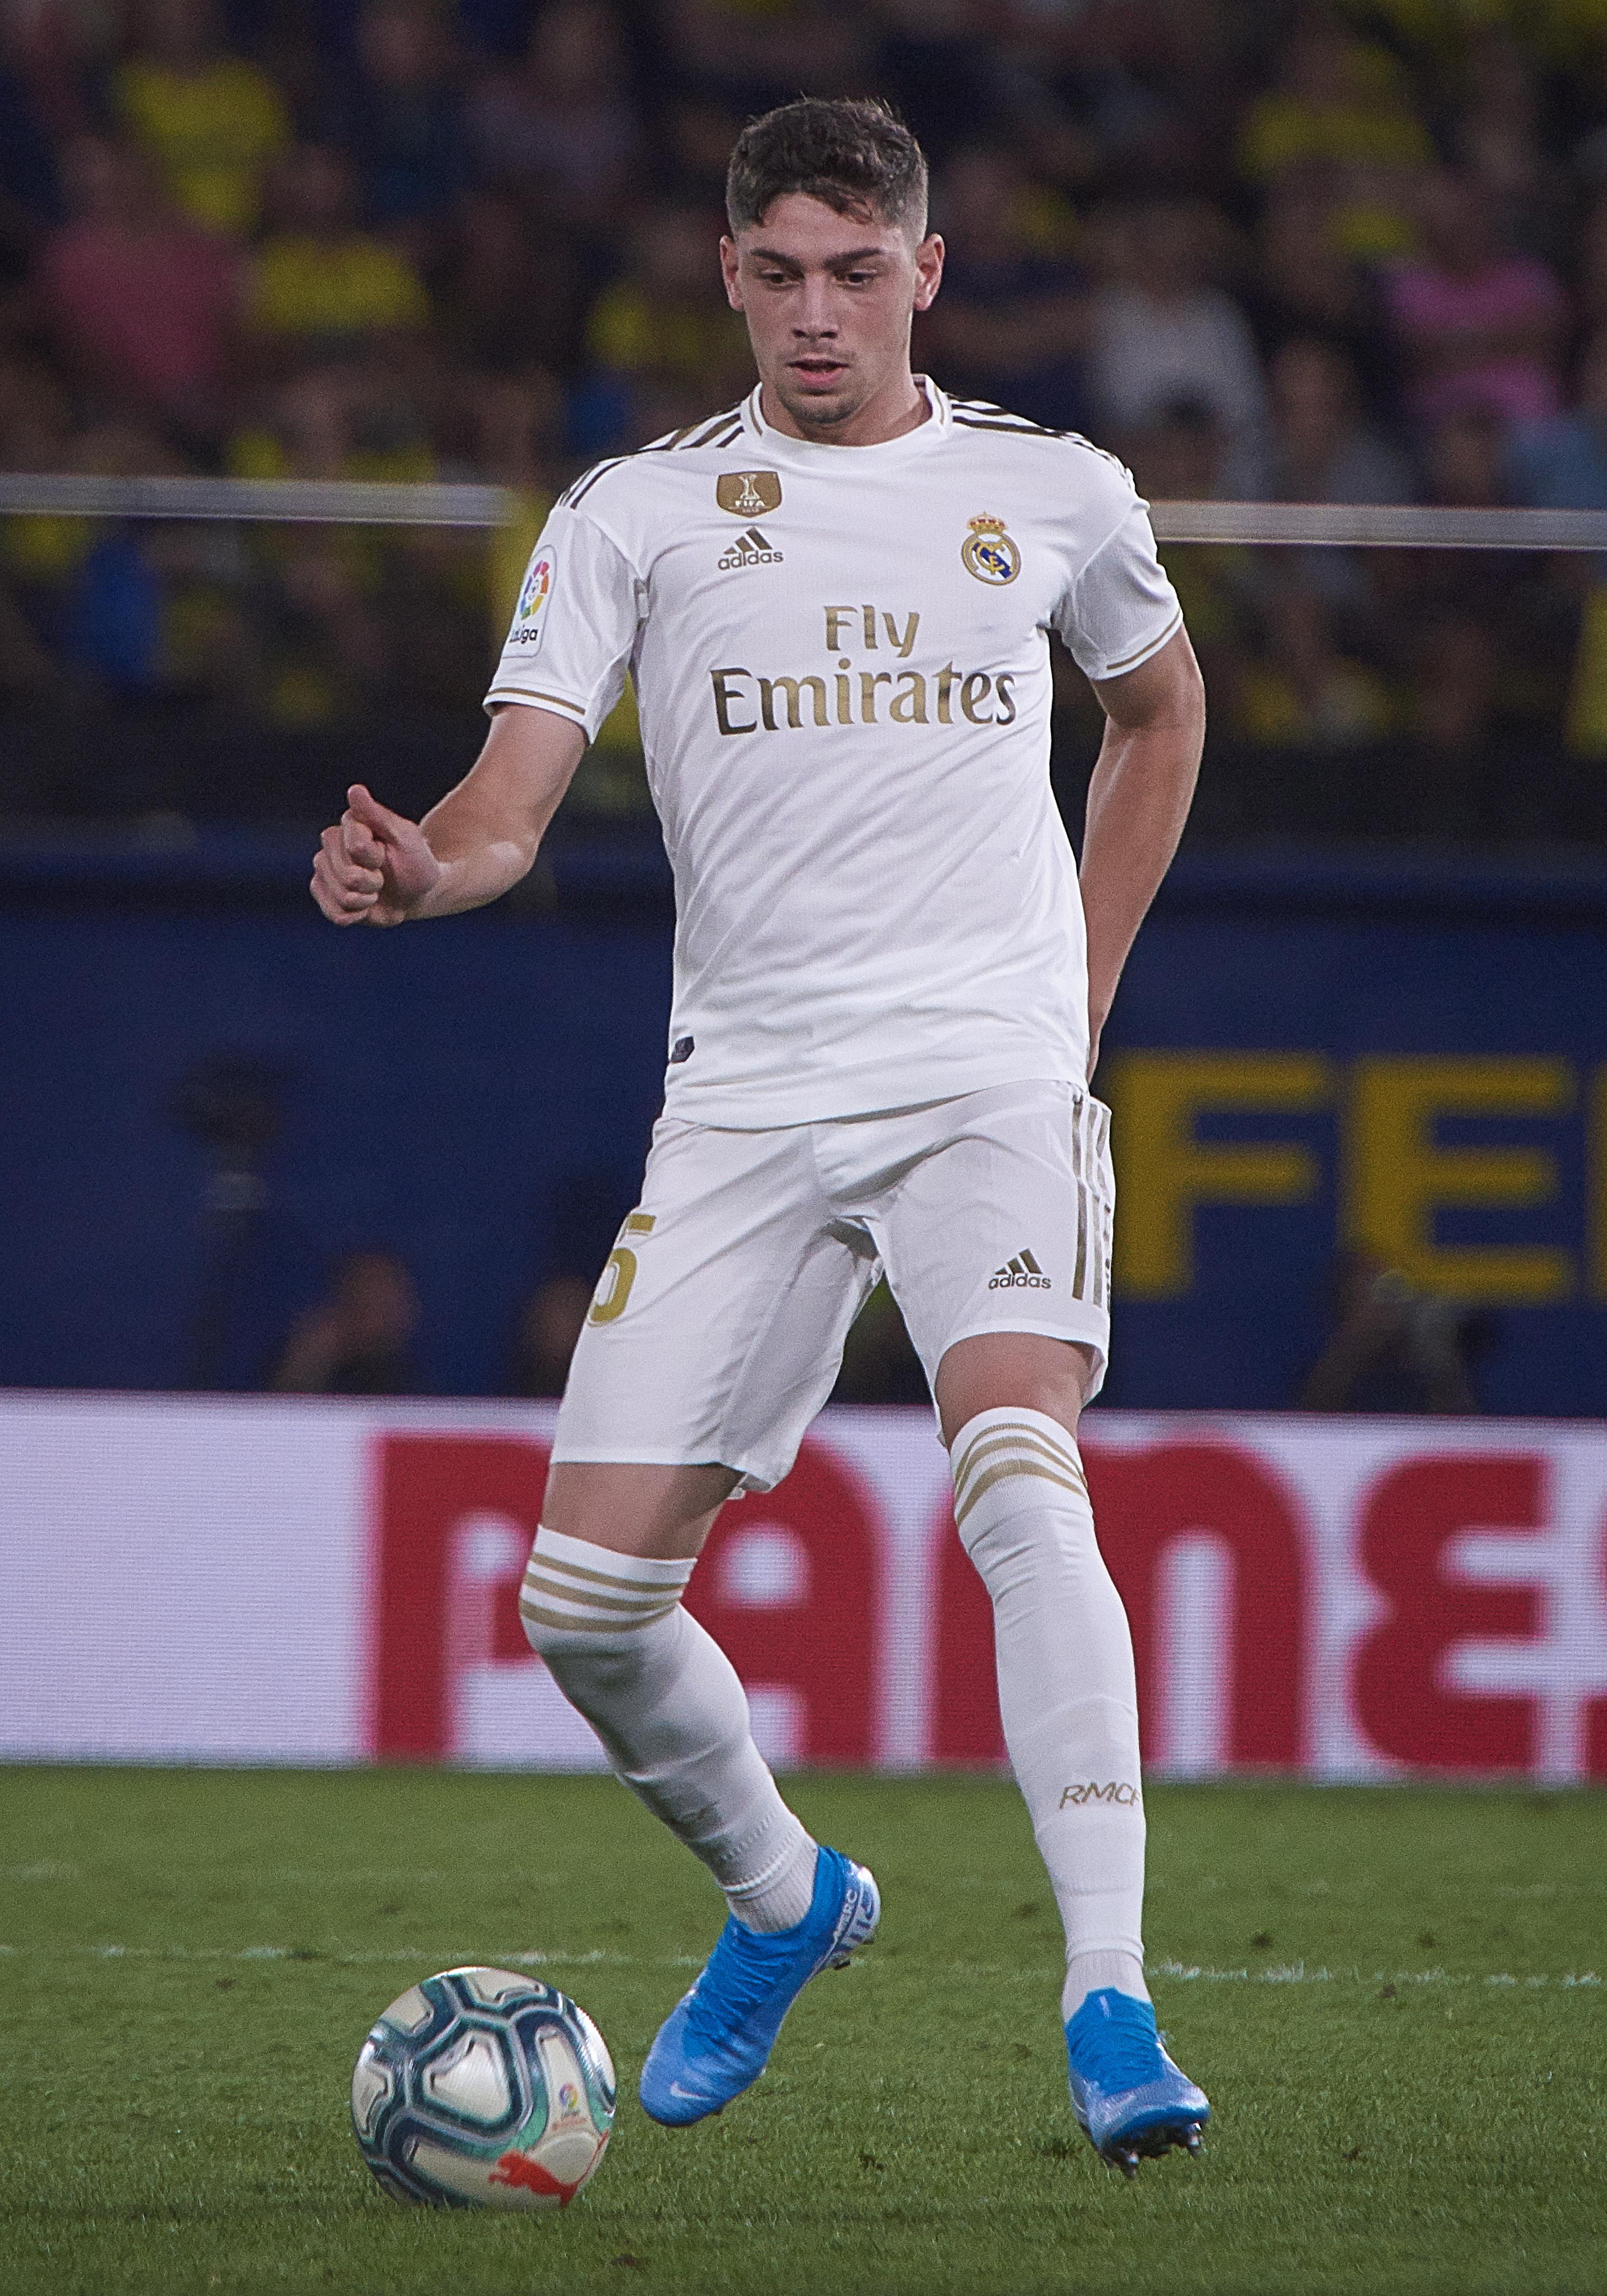 SOCCER: SEP 01 La Liga - Real Madrid CF at Villarreal CF